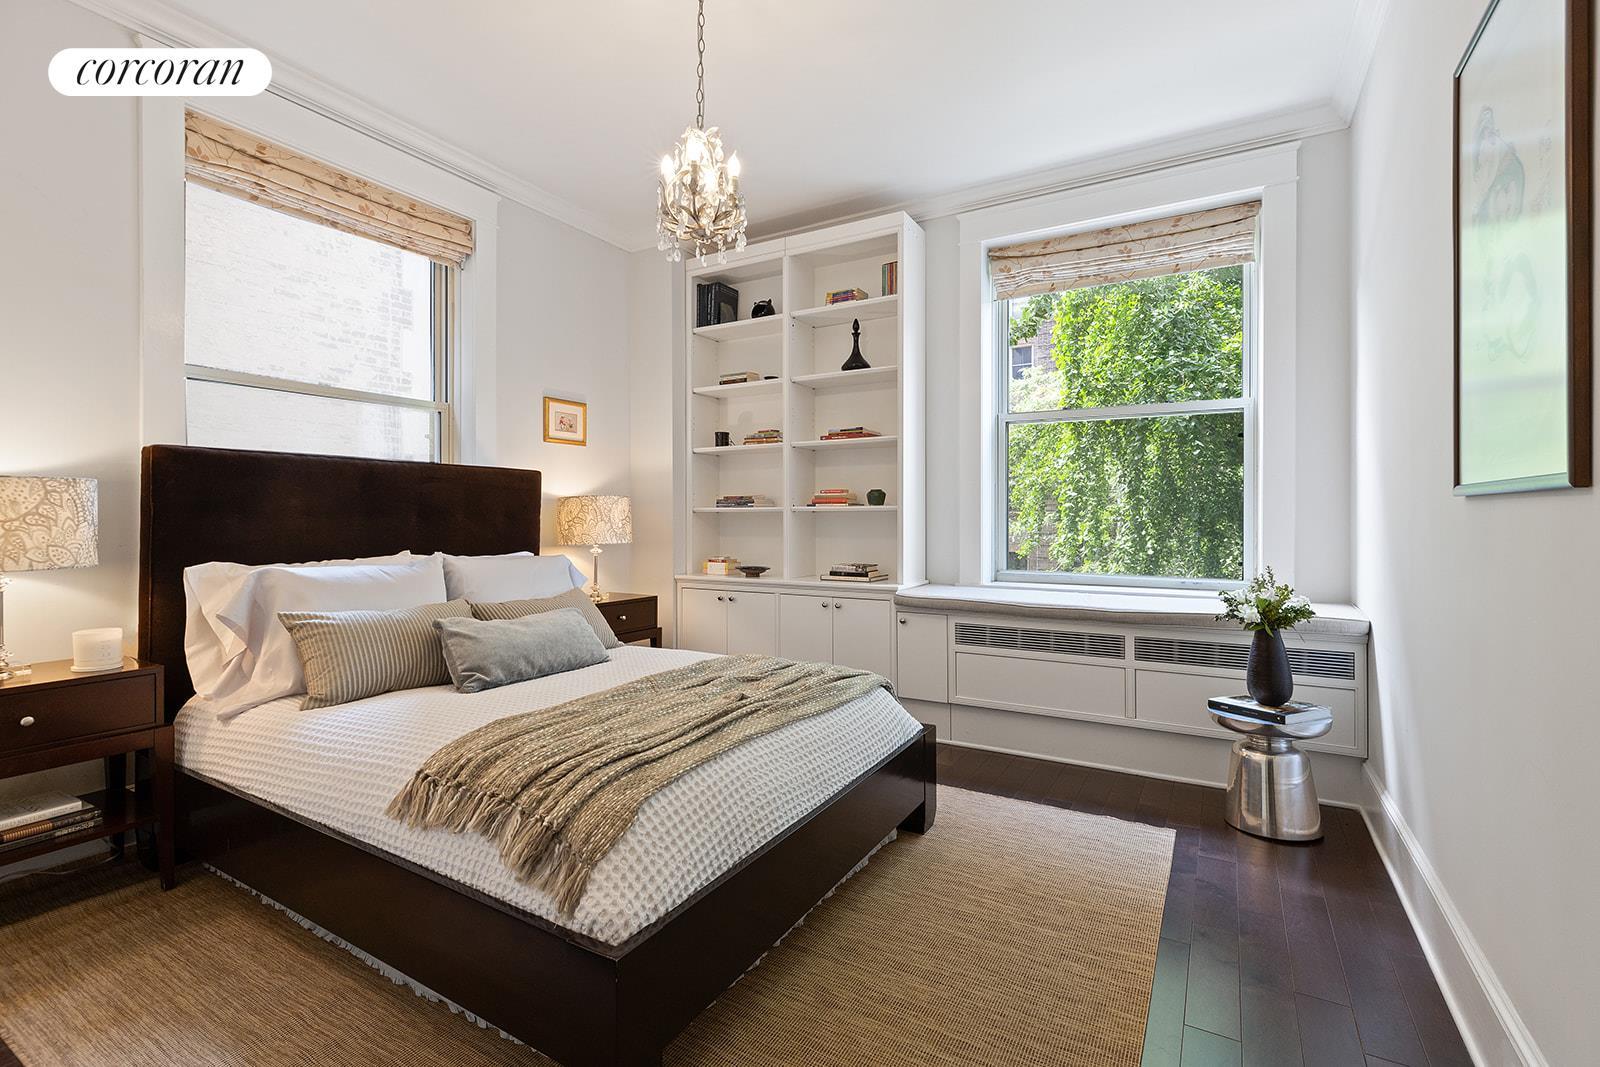 1150 Fifth Avenue Carnegie Hill New York NY 10128